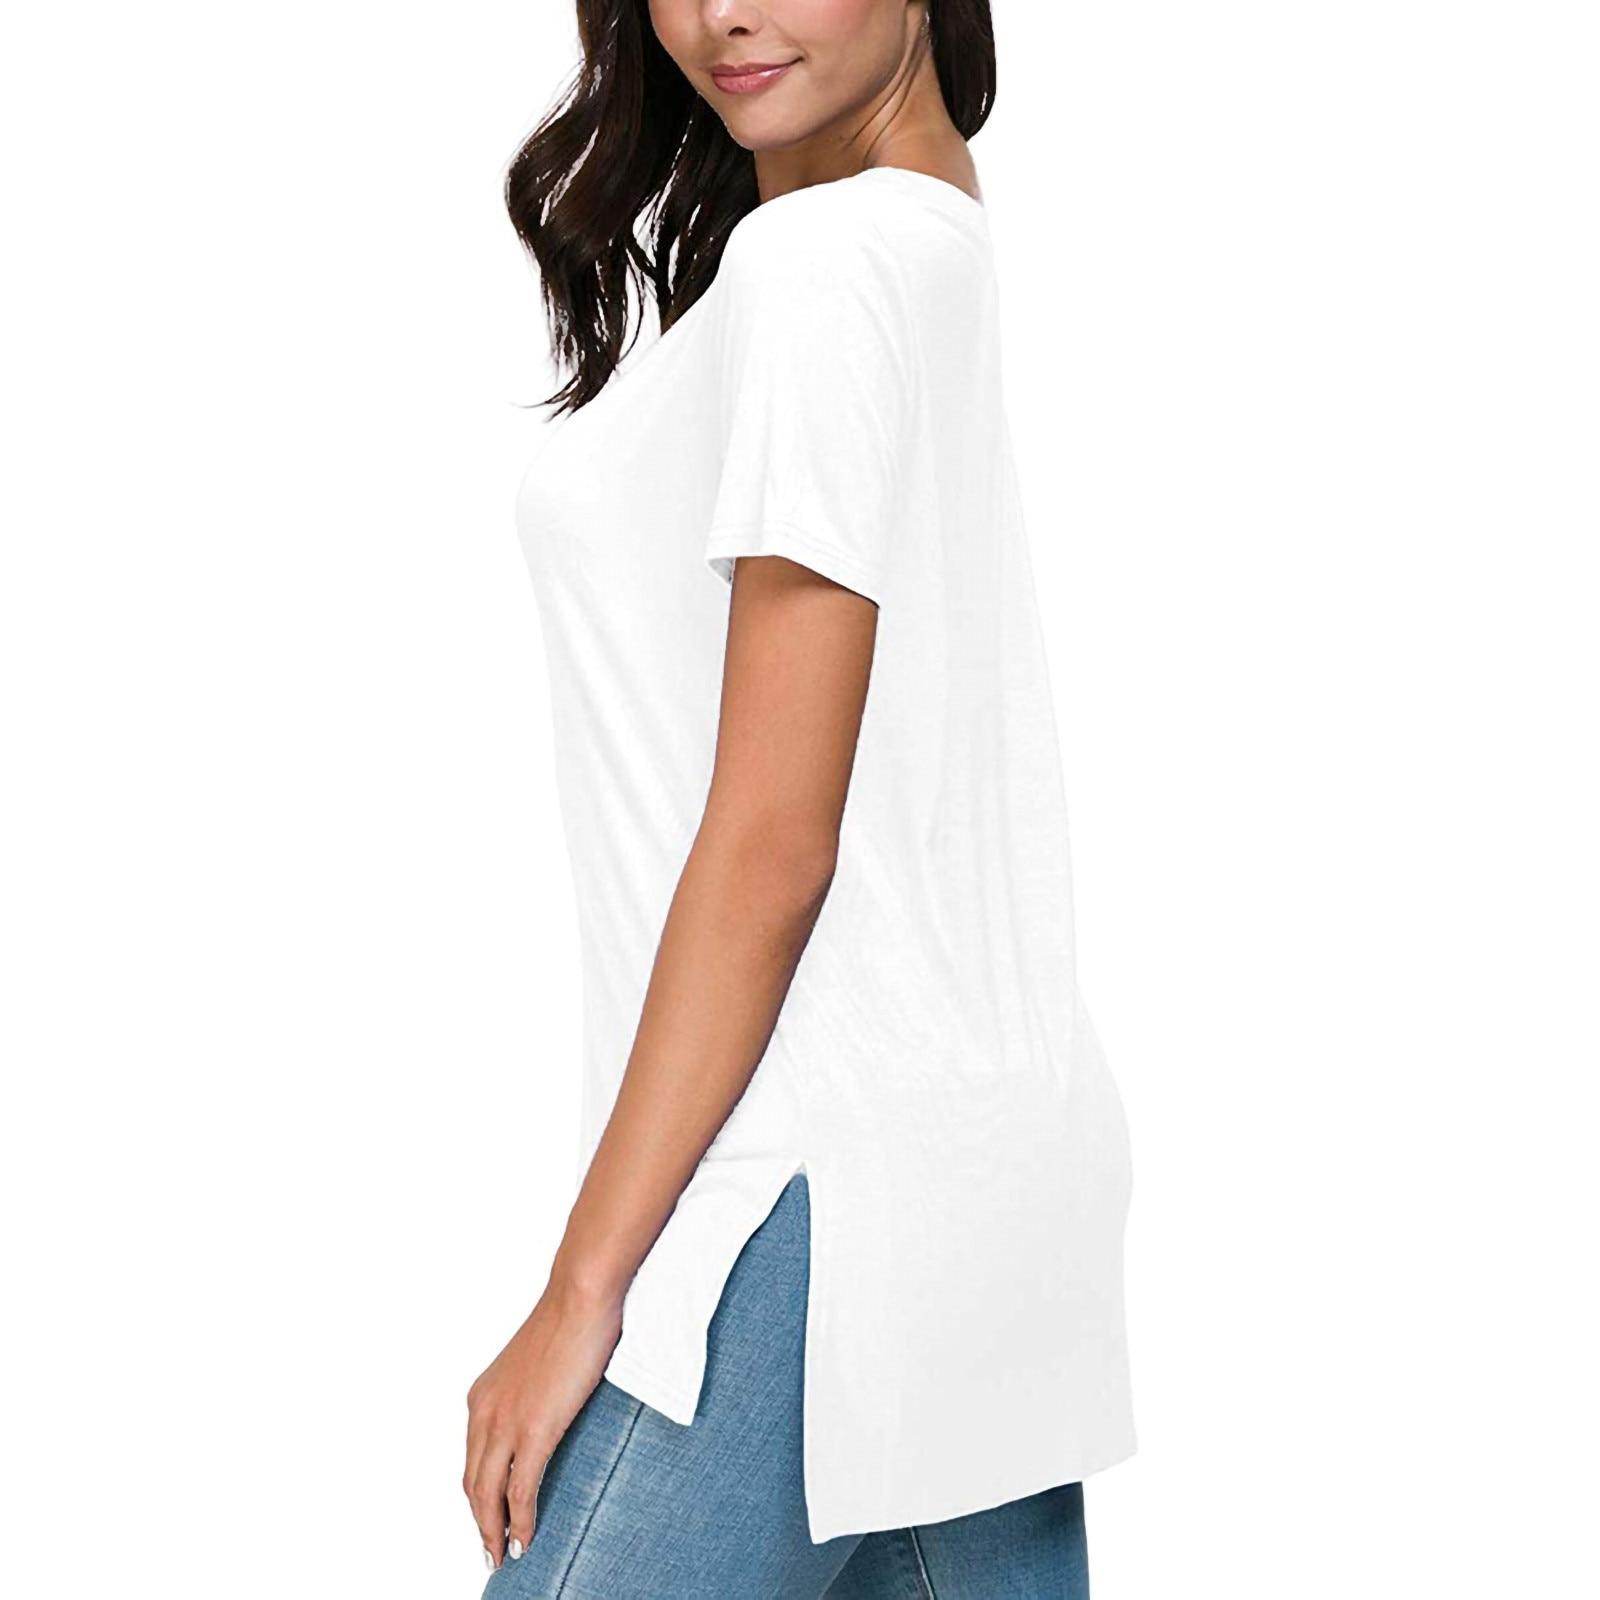 Women's Solid Summer Deep V Neck T-shirts Side Split Short Sleeve Tops Minimalist Style New Summer Women T-shirt Camisetas